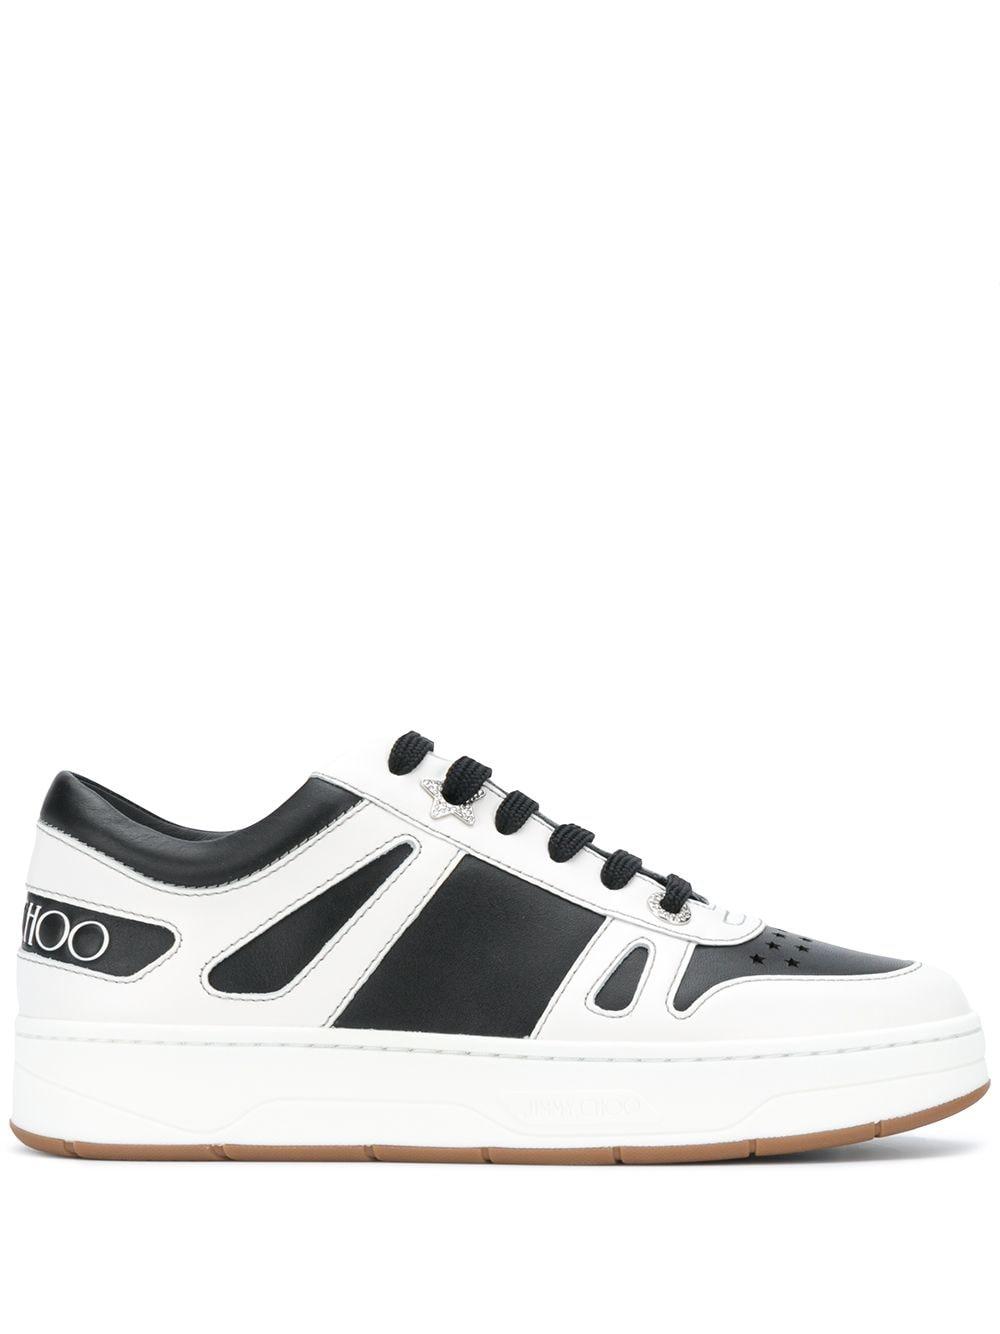 Hawaii Leather Sneakers